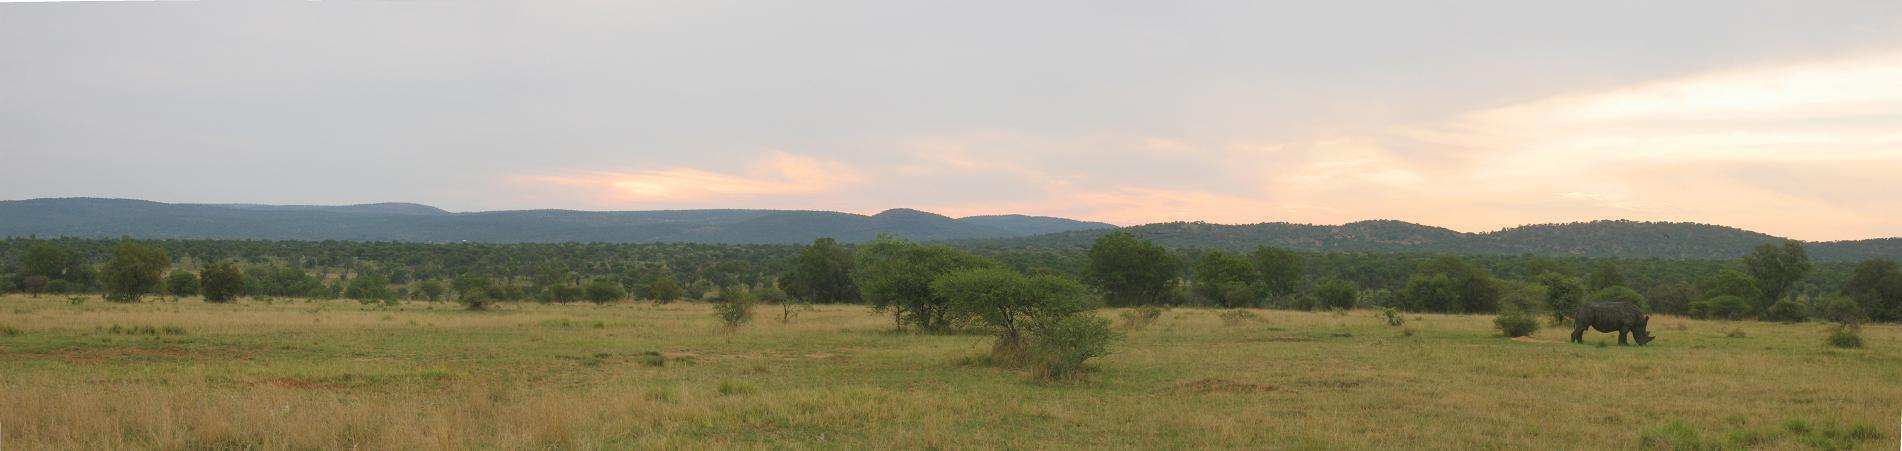 Southafrica_mabalerhino